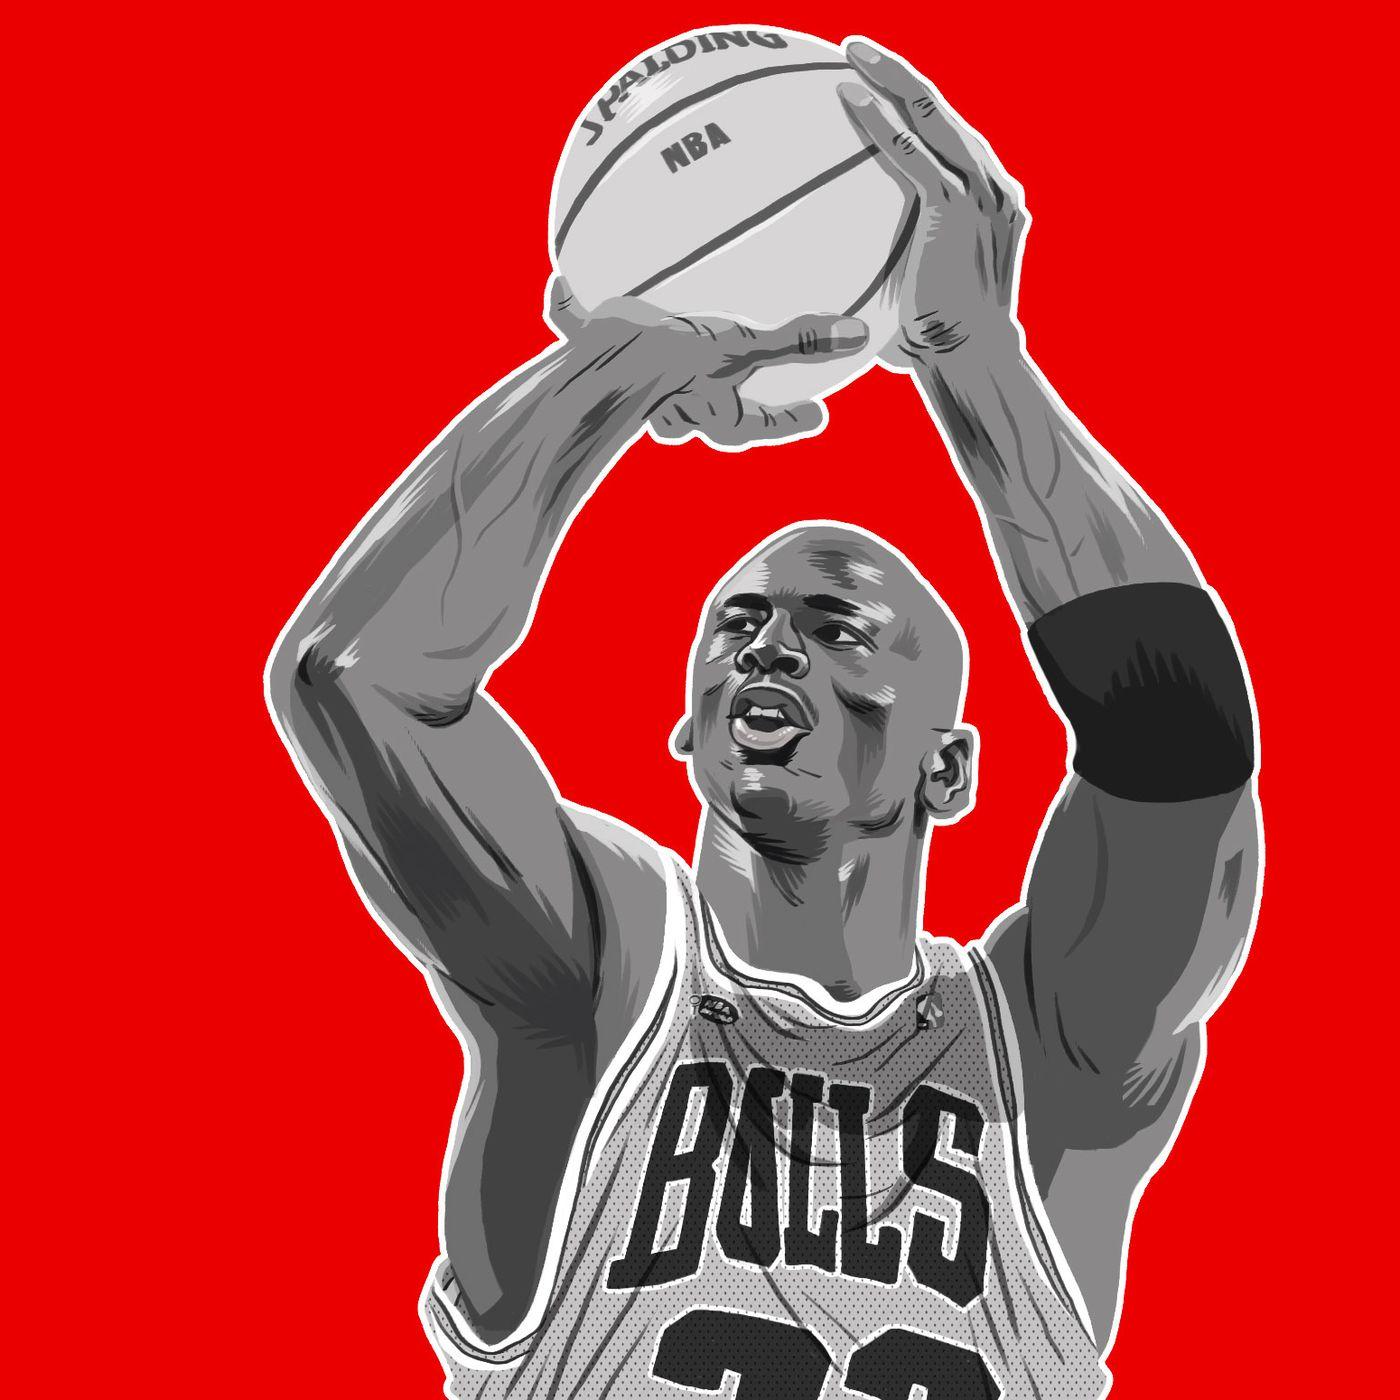 ad0c4ed05832f8 Our Favorite Plays of Jordan s Career - The Ringer